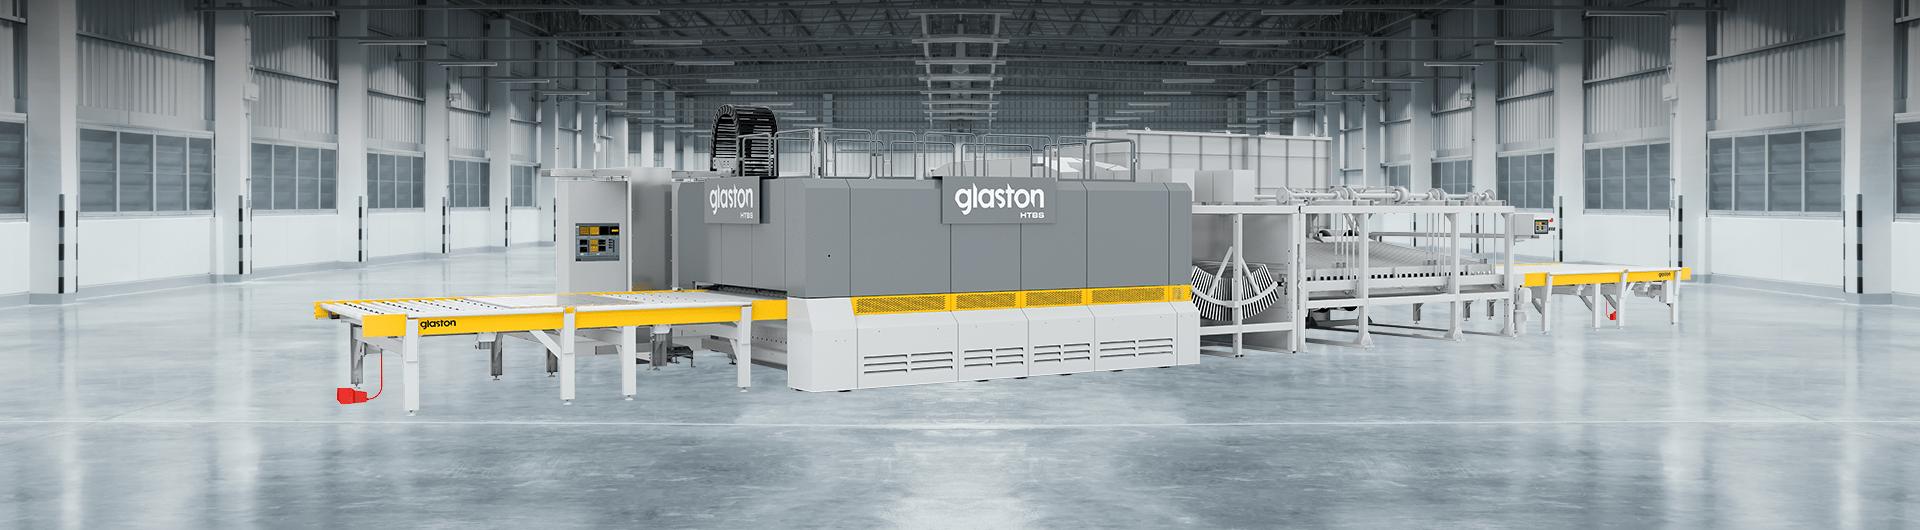 Glaston Horizontal Tempering & Bending System HTBS